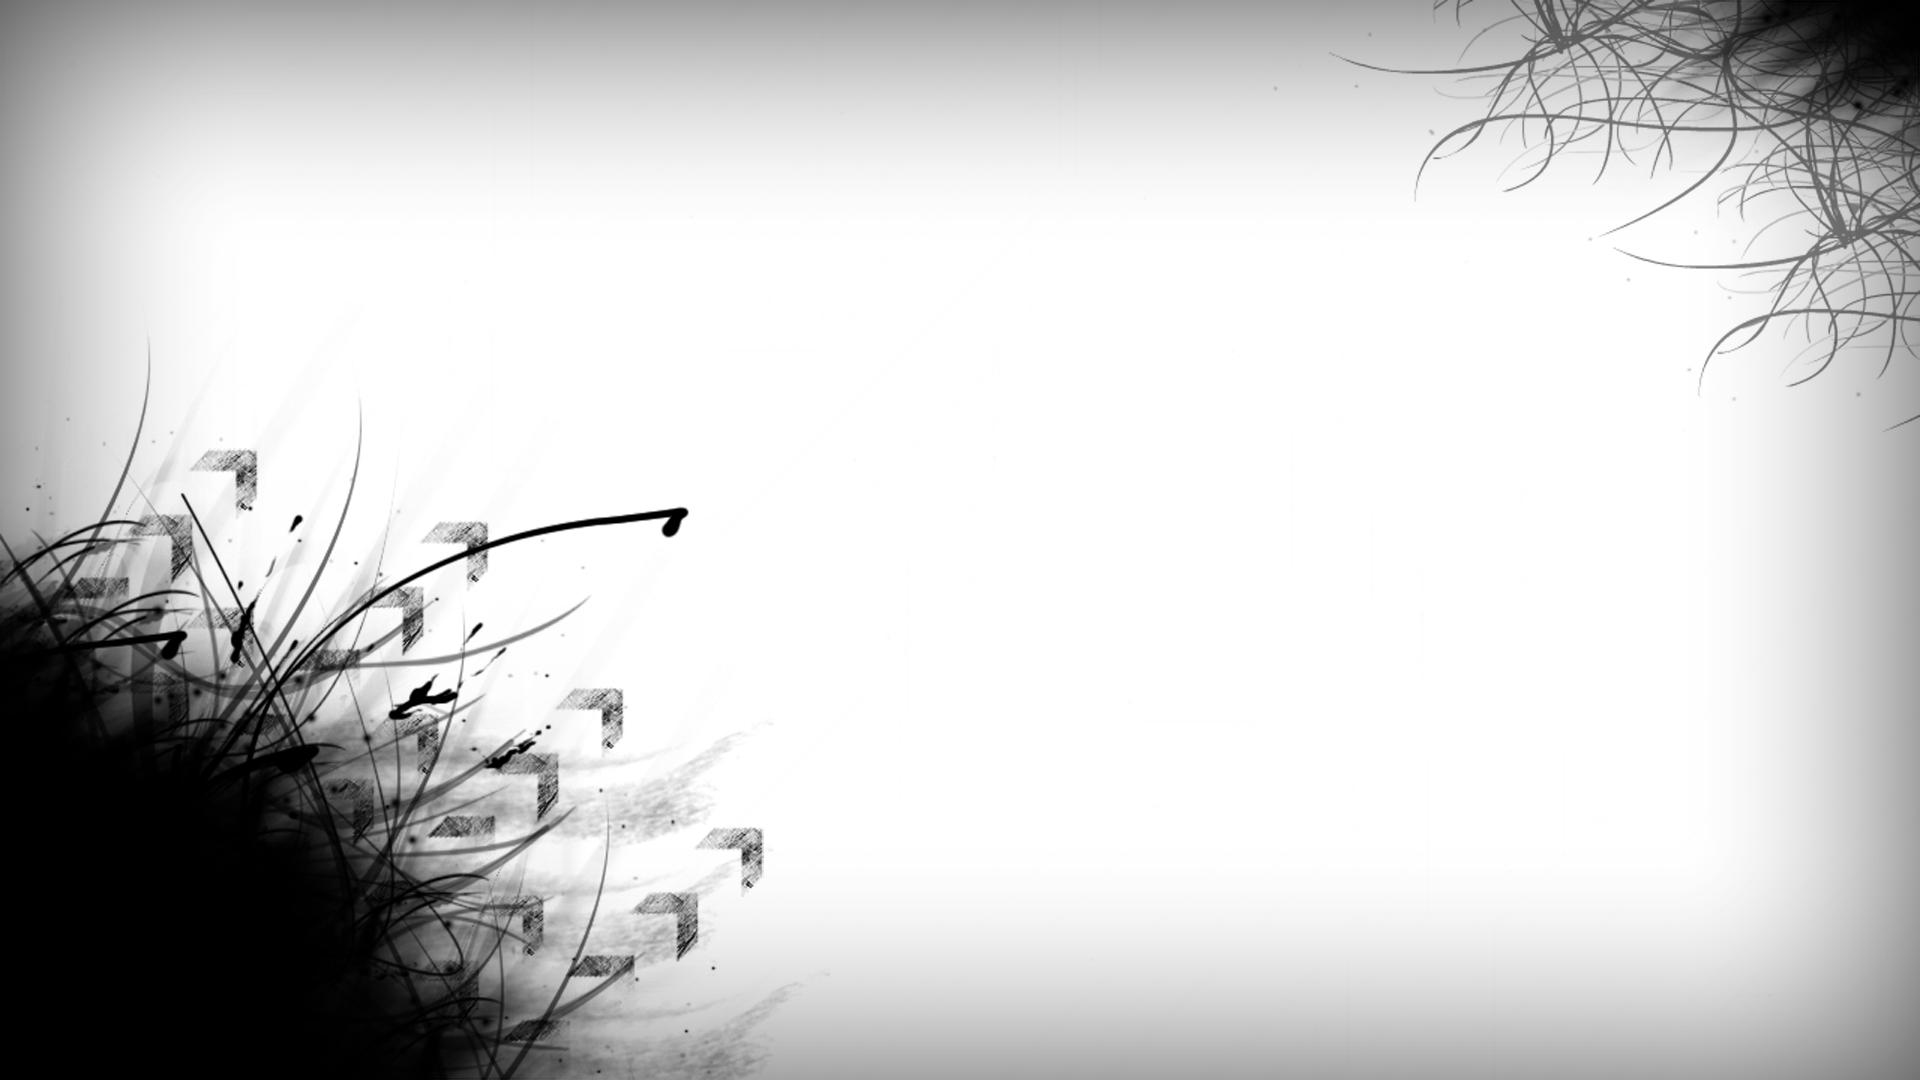 Black And White Wallpaper by YeikoSV